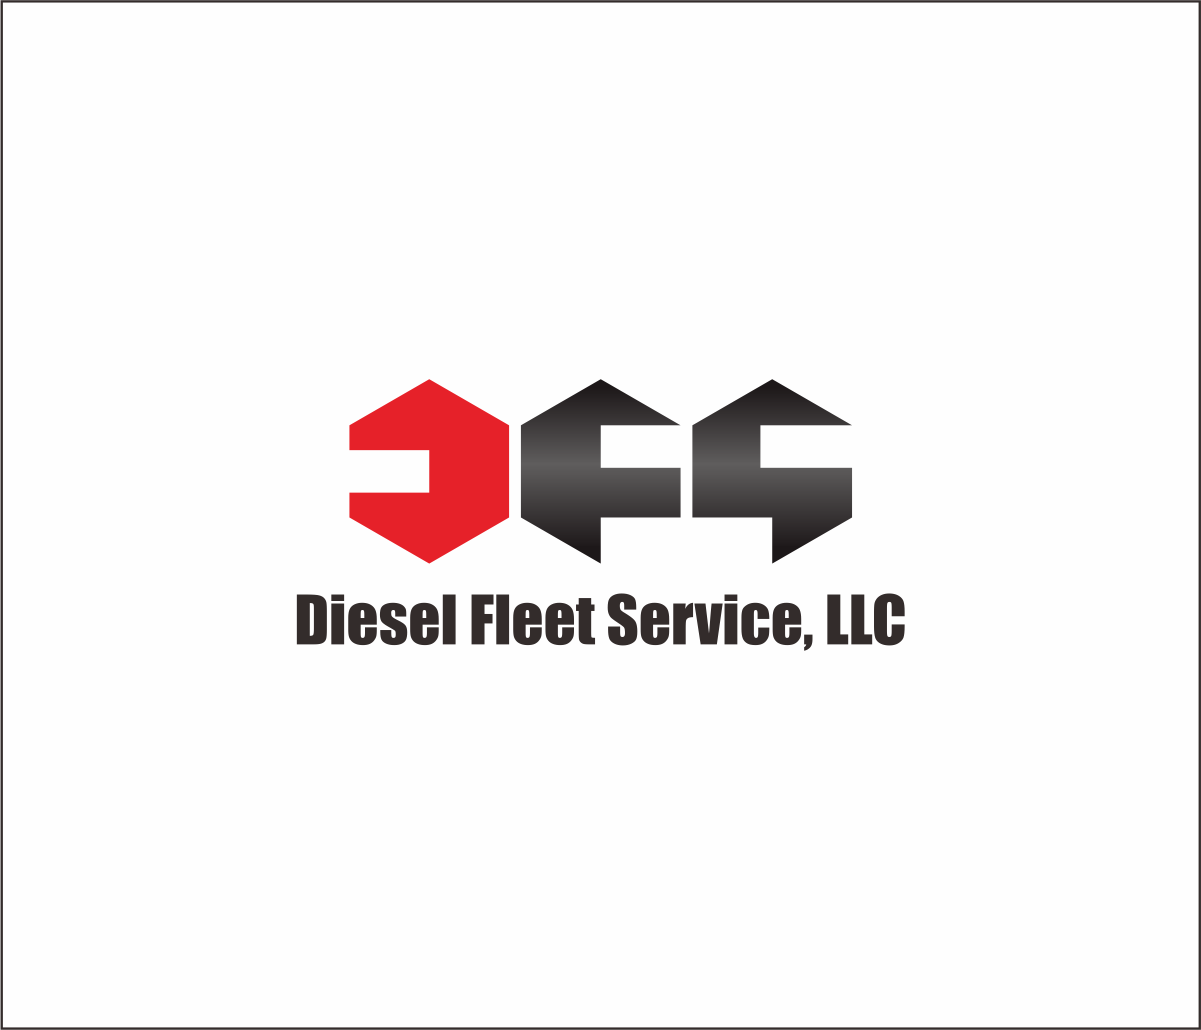 Logo Design by Armada Jamaluddin - Entry No. 96 in the Logo Design Contest Artistic Logo Design for Diesel Fleet Service, LLC.